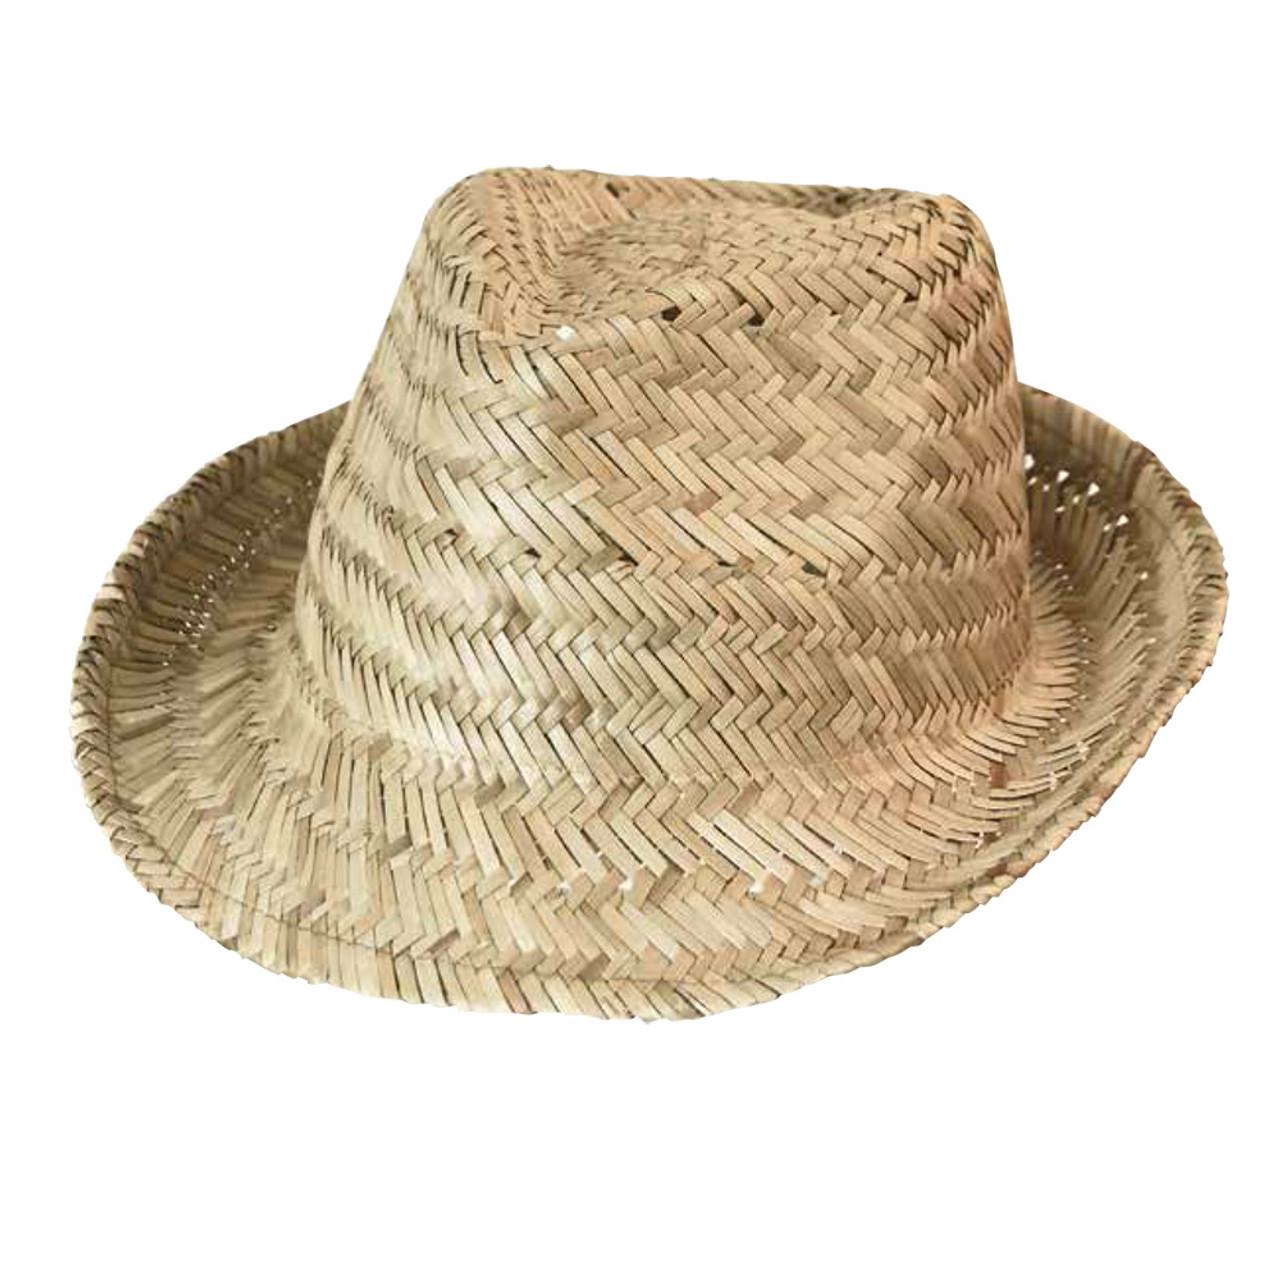 c0a56cd38d3 wholesale plain straw fedora hat